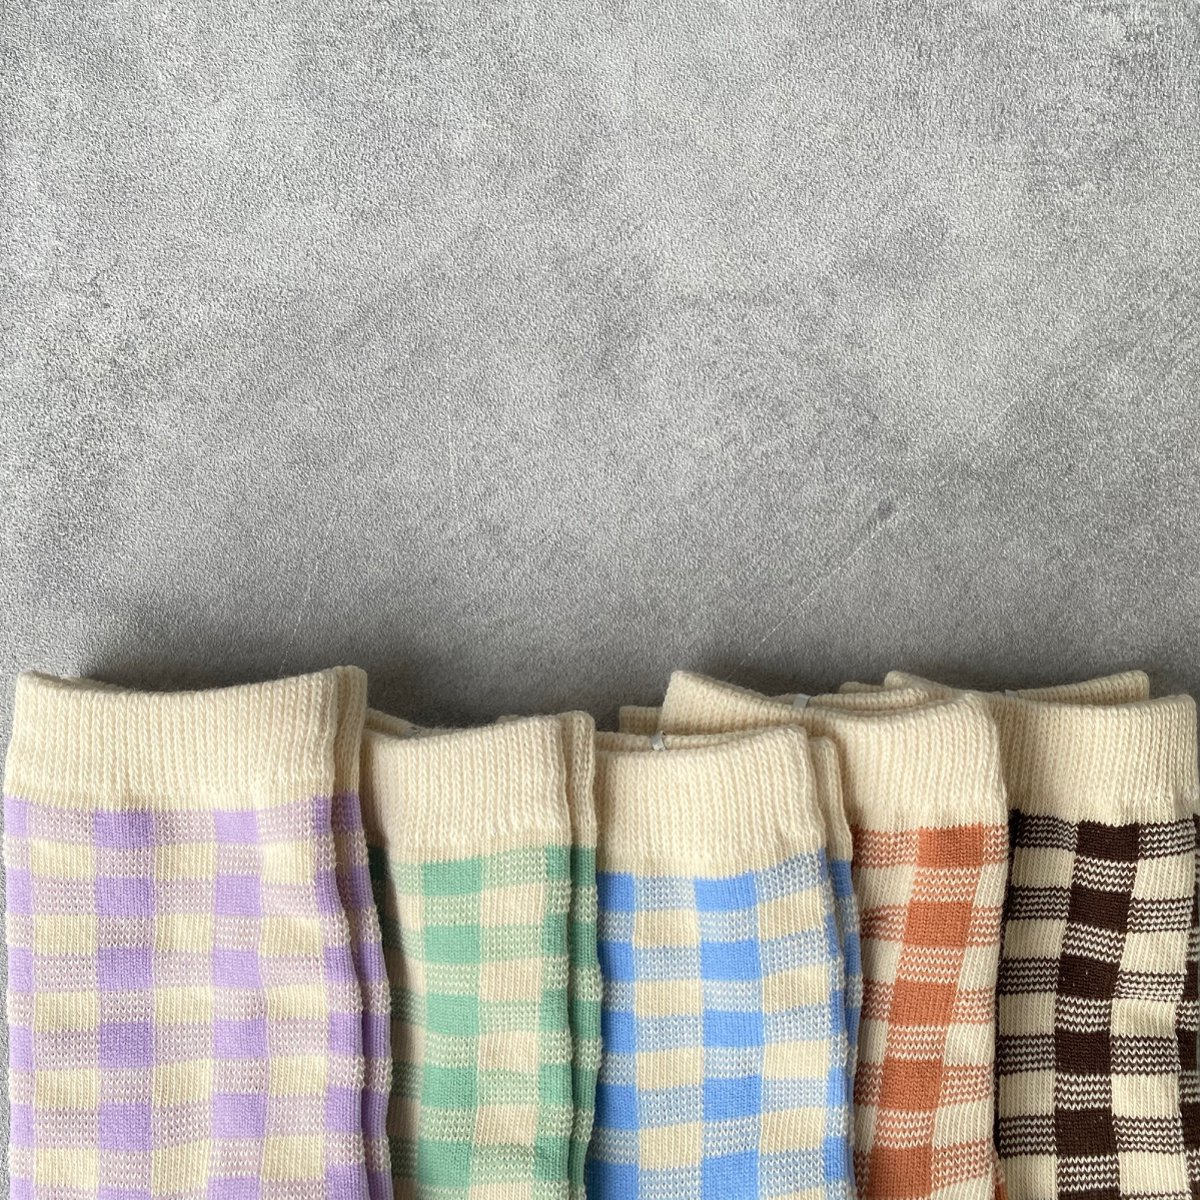 【BABY】Natural Check Socks 詳細画像7